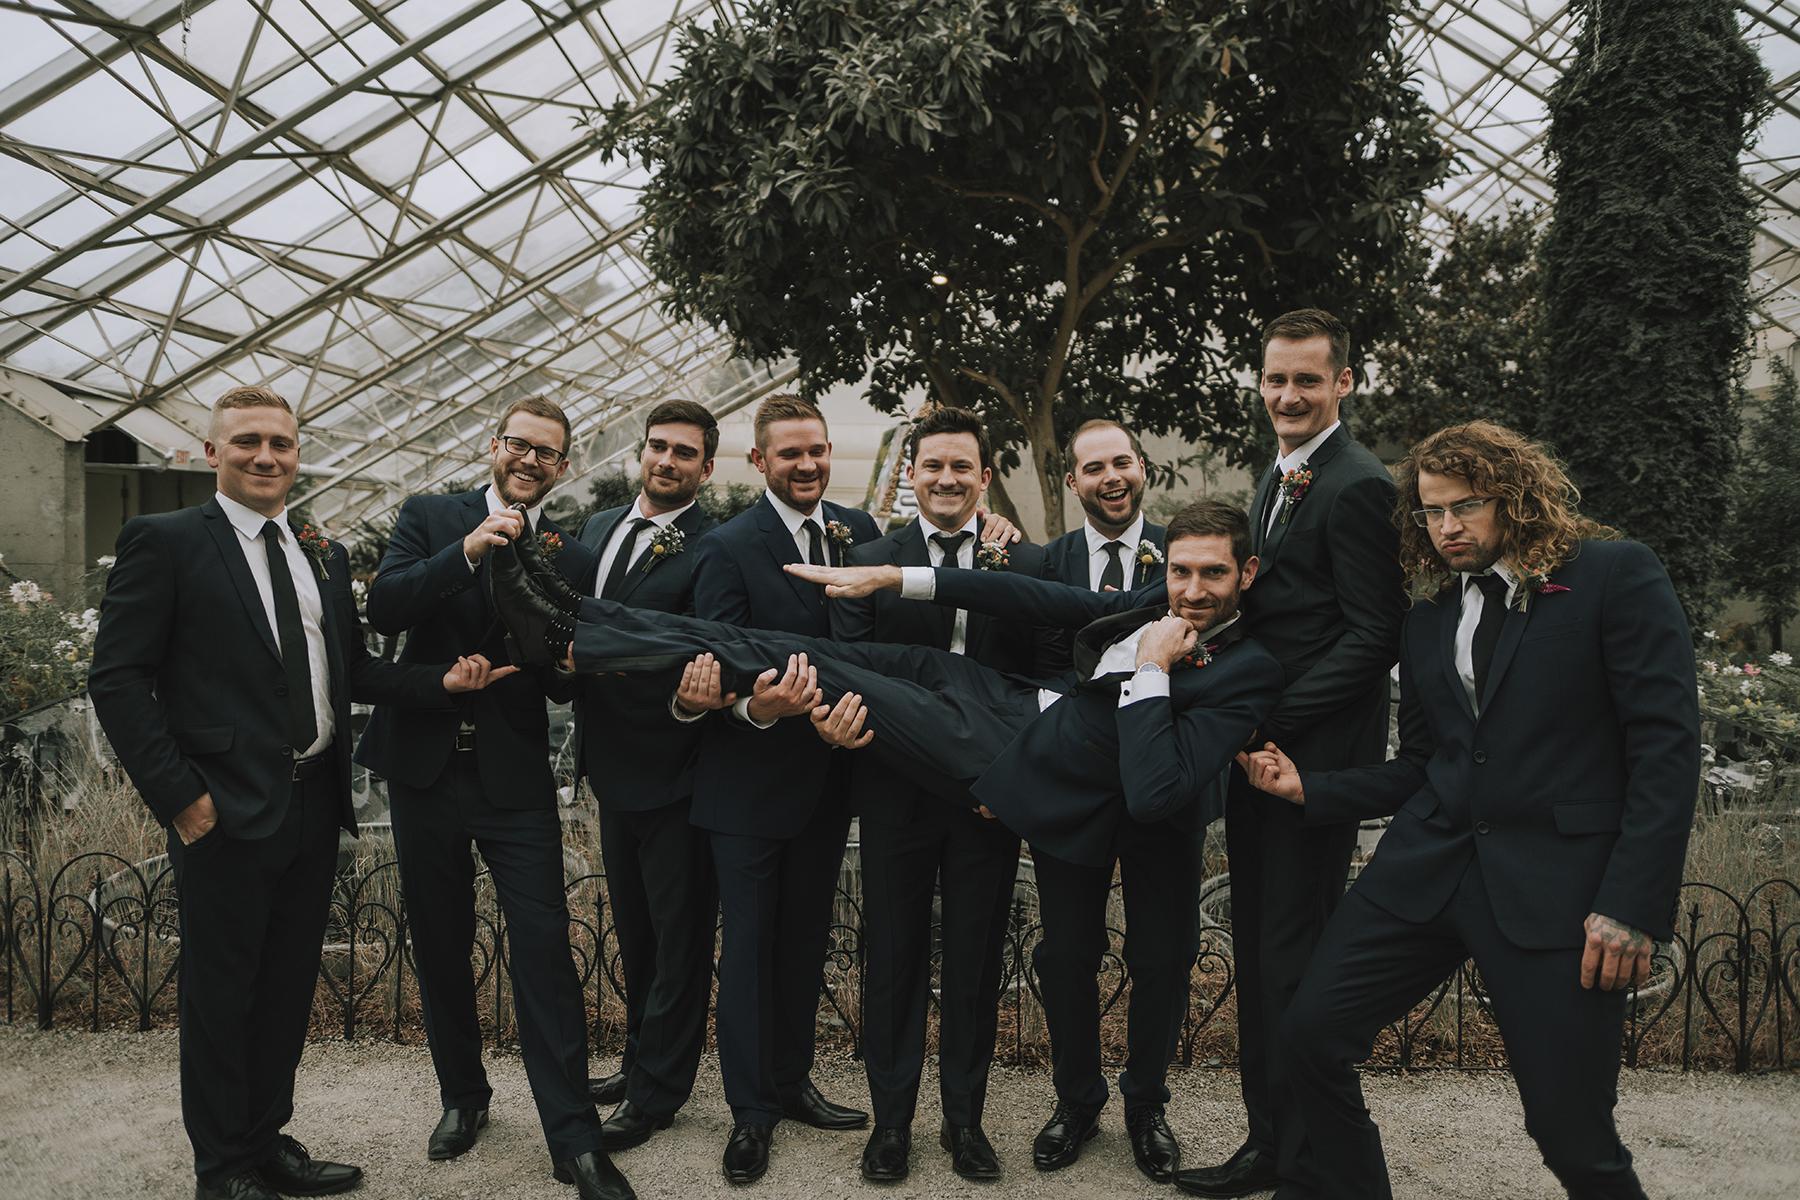 Foellinger-Freimann Botanical Conservatory indianapolis indiana hannah bergman Photography groom groomsmen